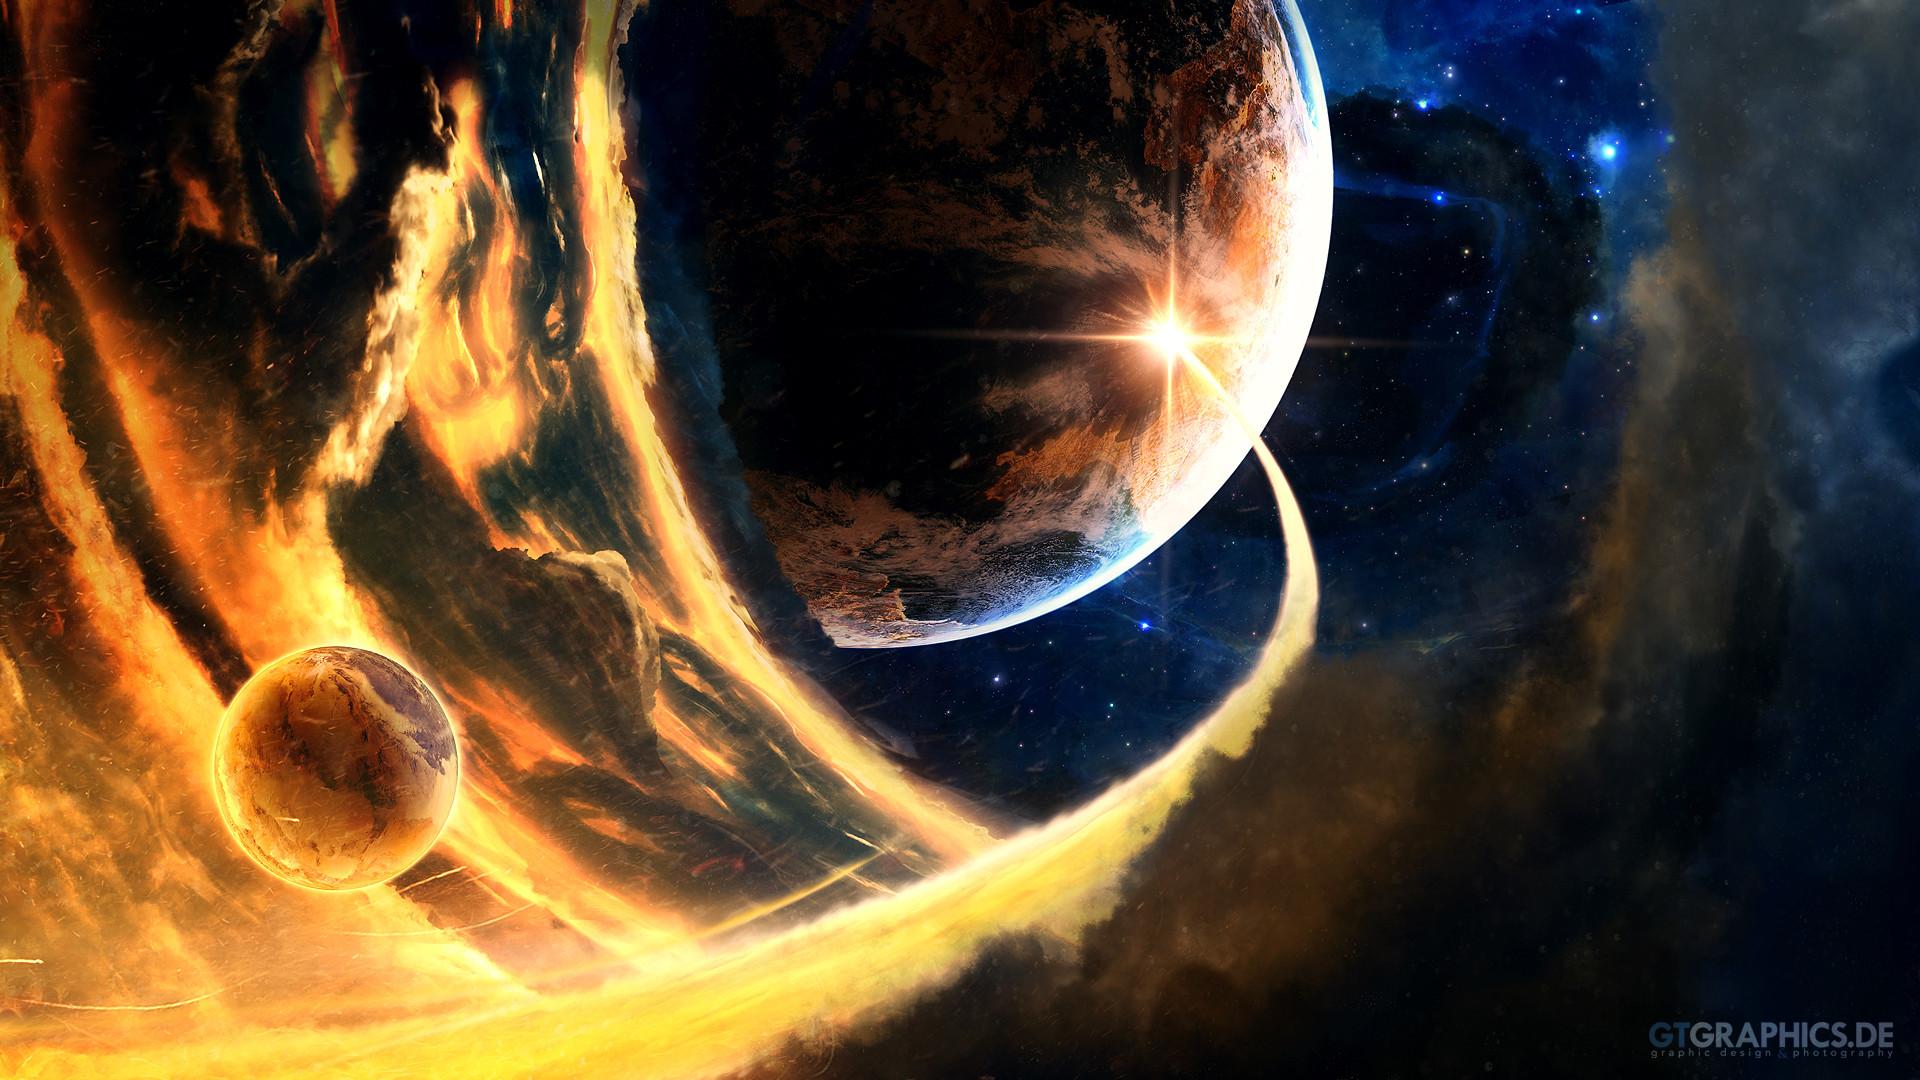 HD wallpaper Planet Saturn Wallpaper | fff | Pinterest | Wallpaper, Planets  and Hd galaxy wallpaper